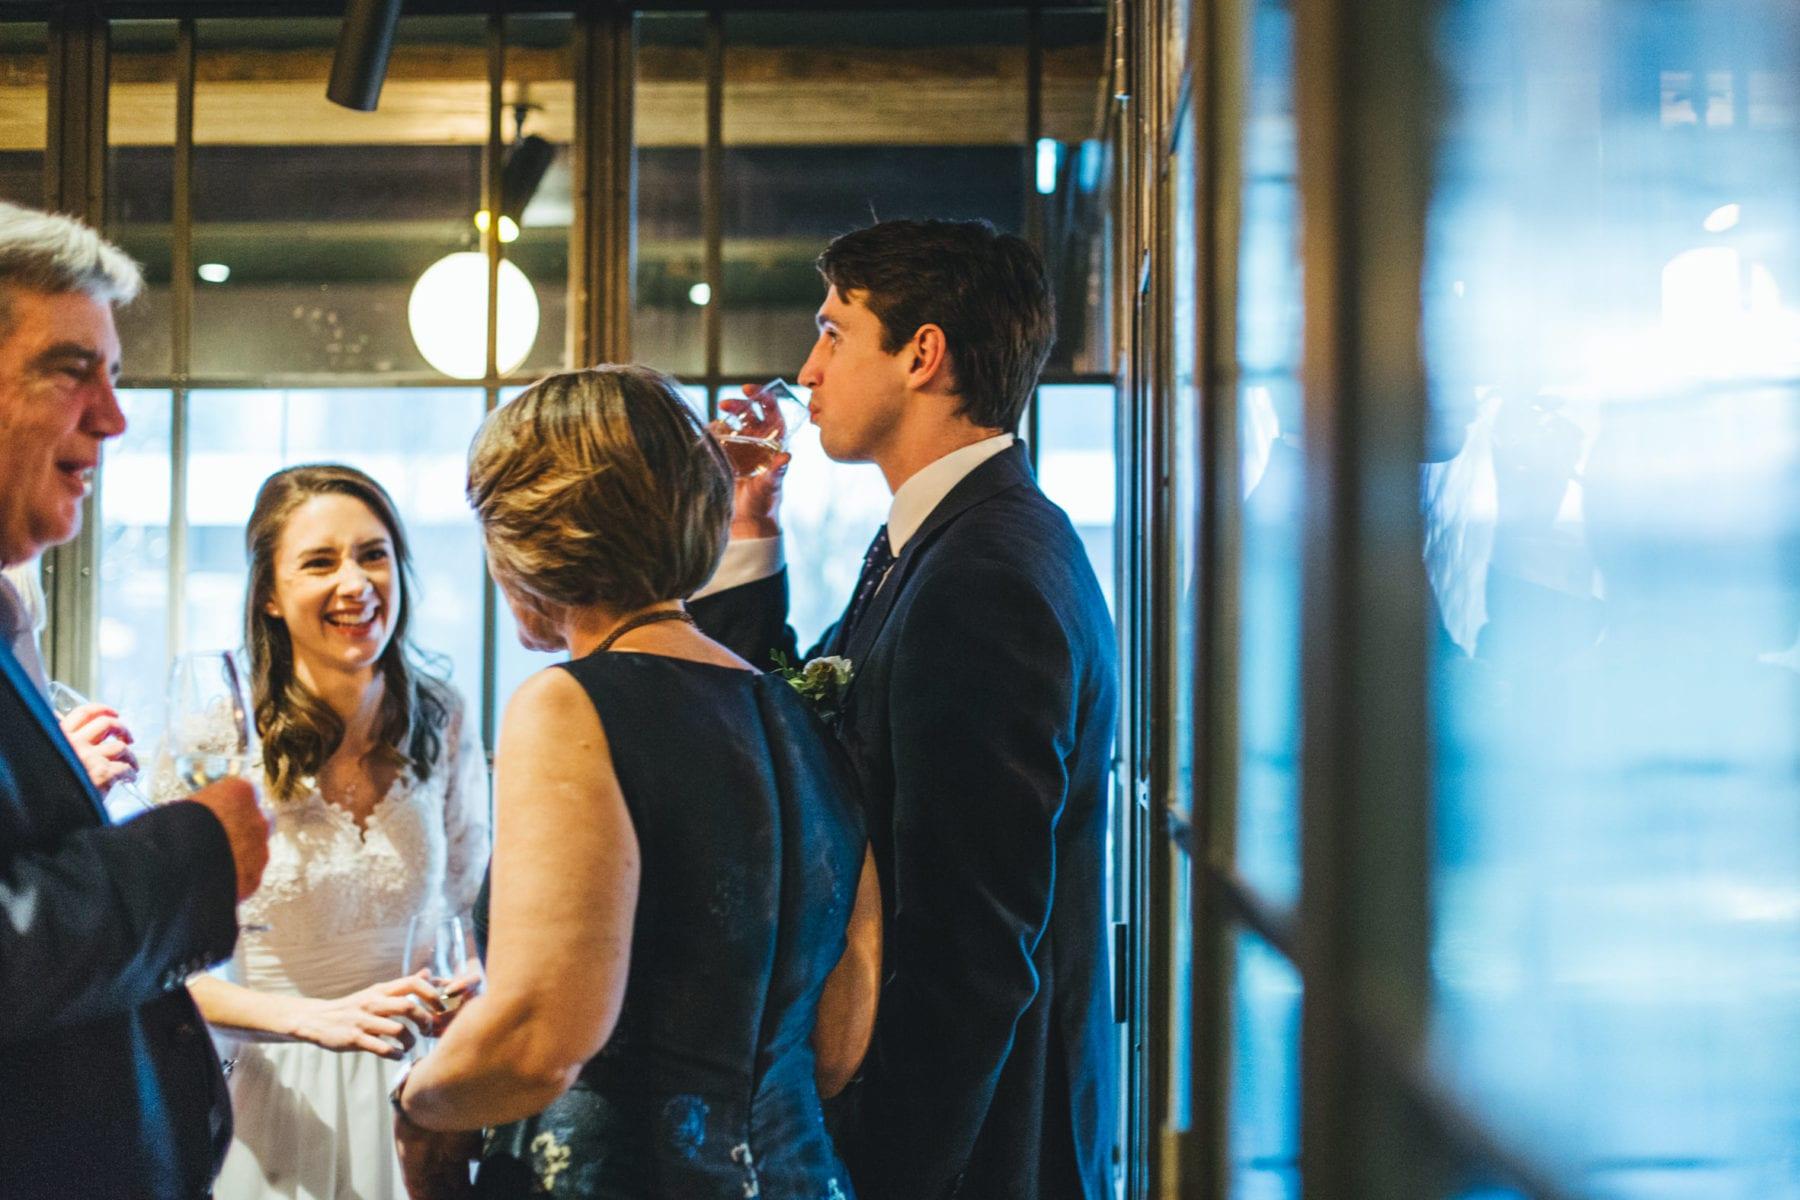 Coal Shed London wedding  - wedding photographer London